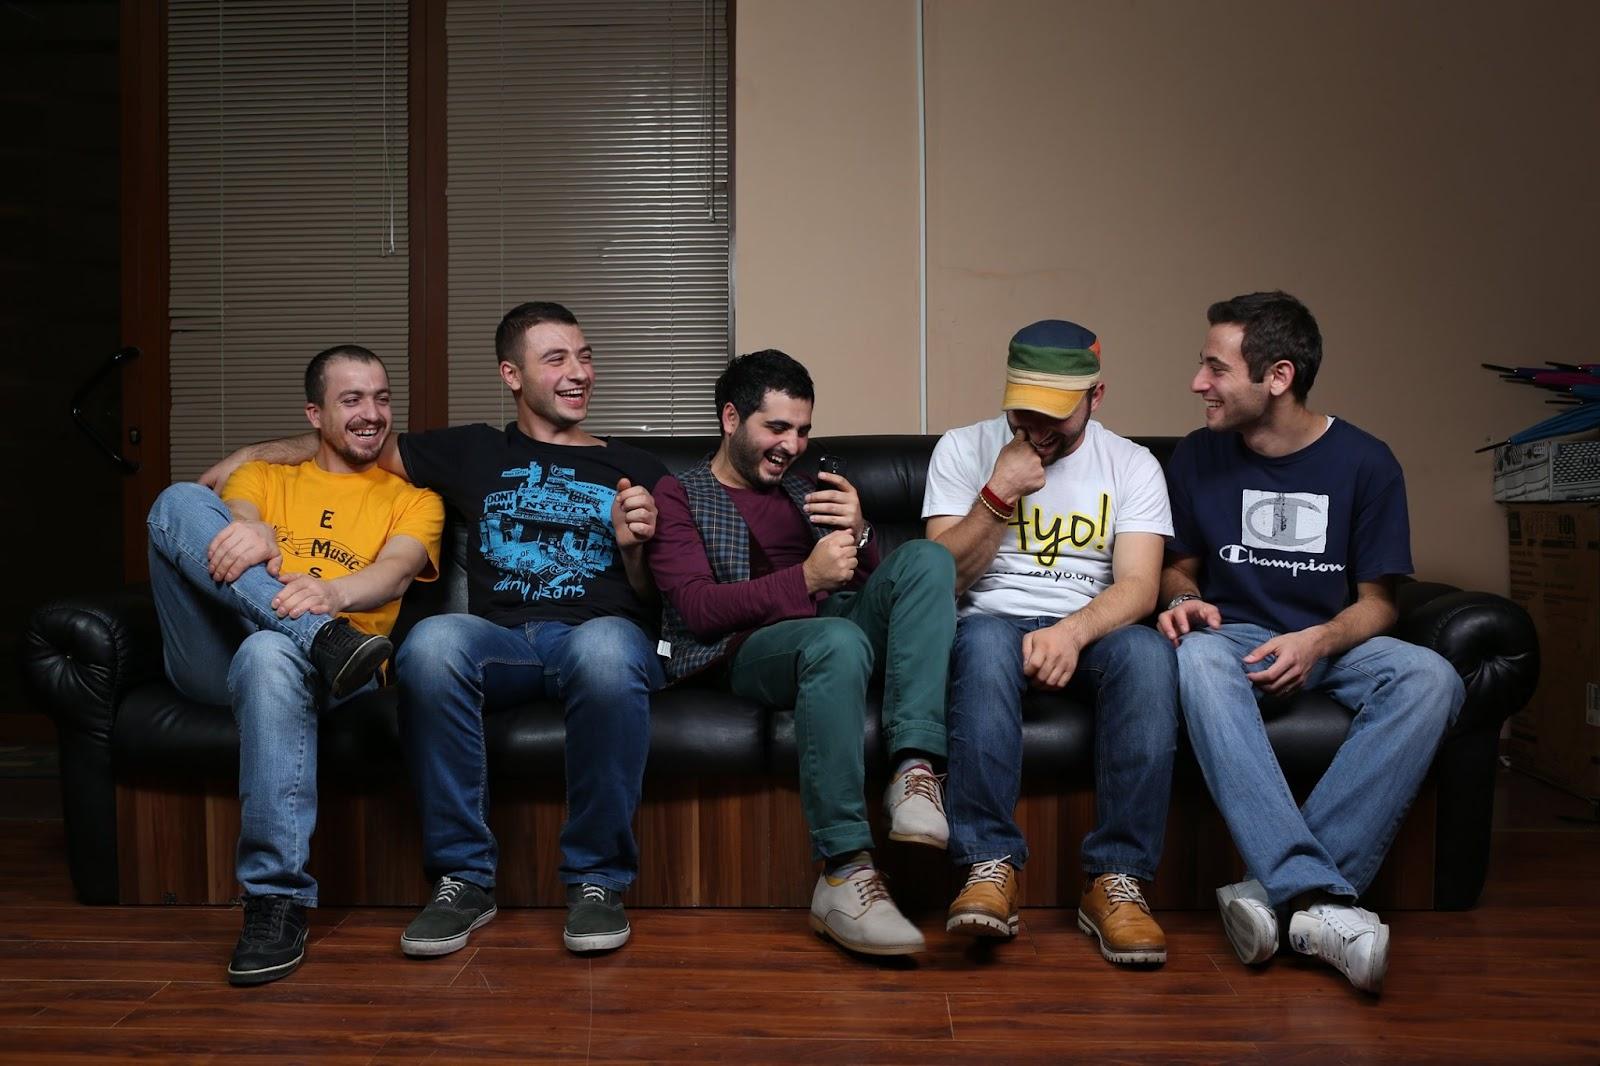 The band (L-R): Gurgen Ebejyan, Arman Peshtmaljian, Miqayel Voskanyan, Movses Ebejyan, and David Melkonyan. (Photo courtesy of the MVF Band)